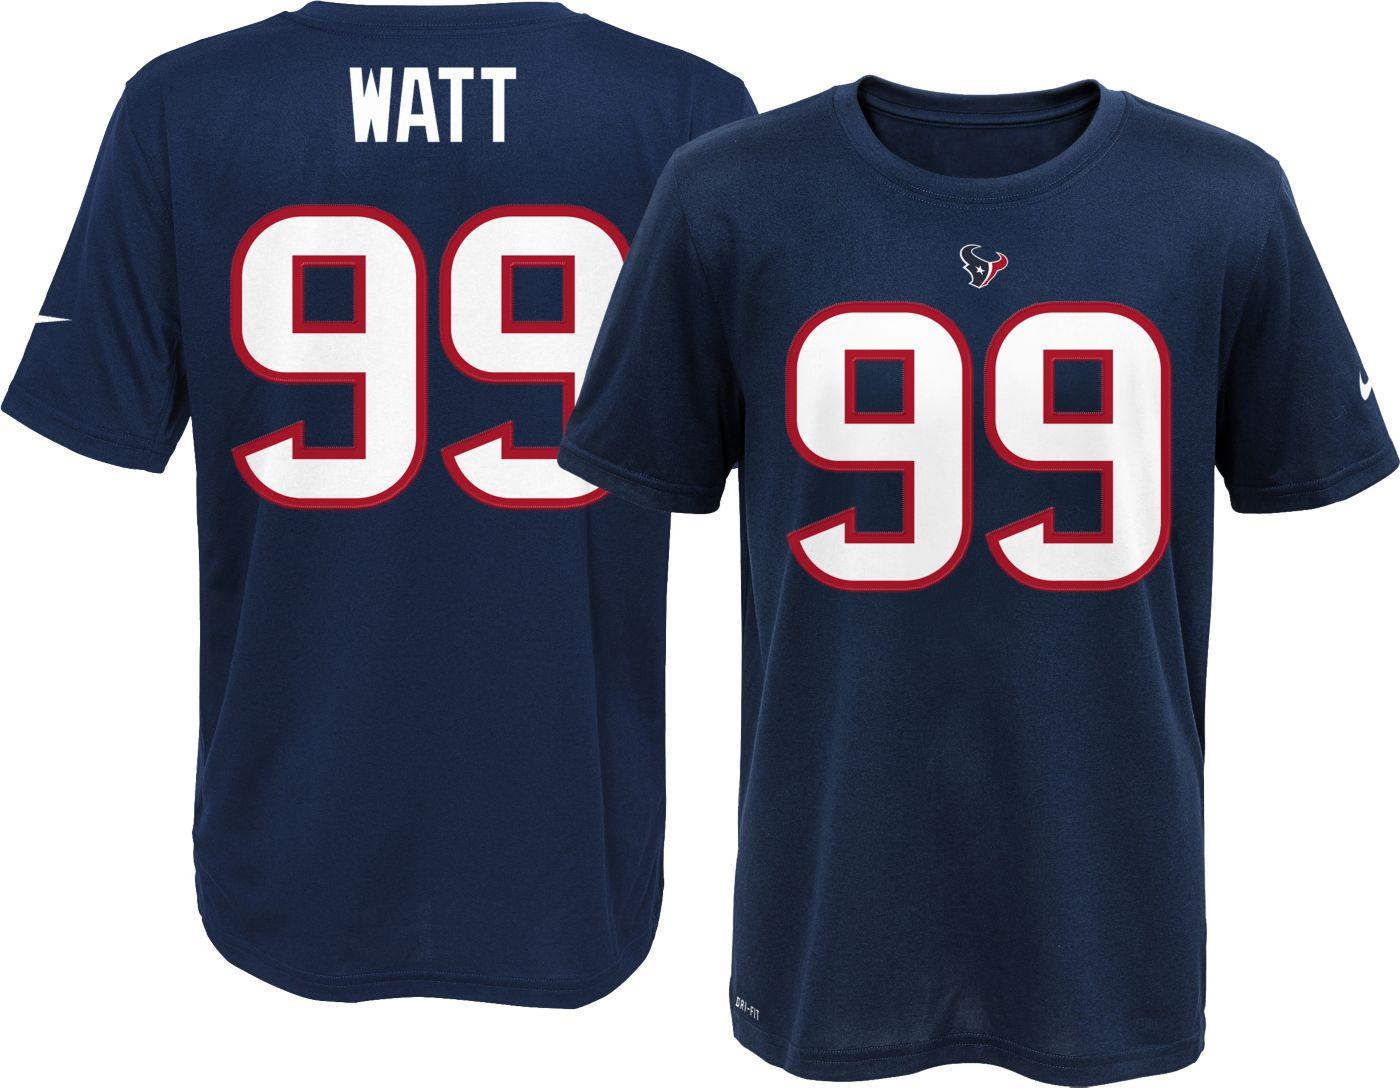 Nike Youth Houston Texans J.J. Watt #99 Navy T-Shirt